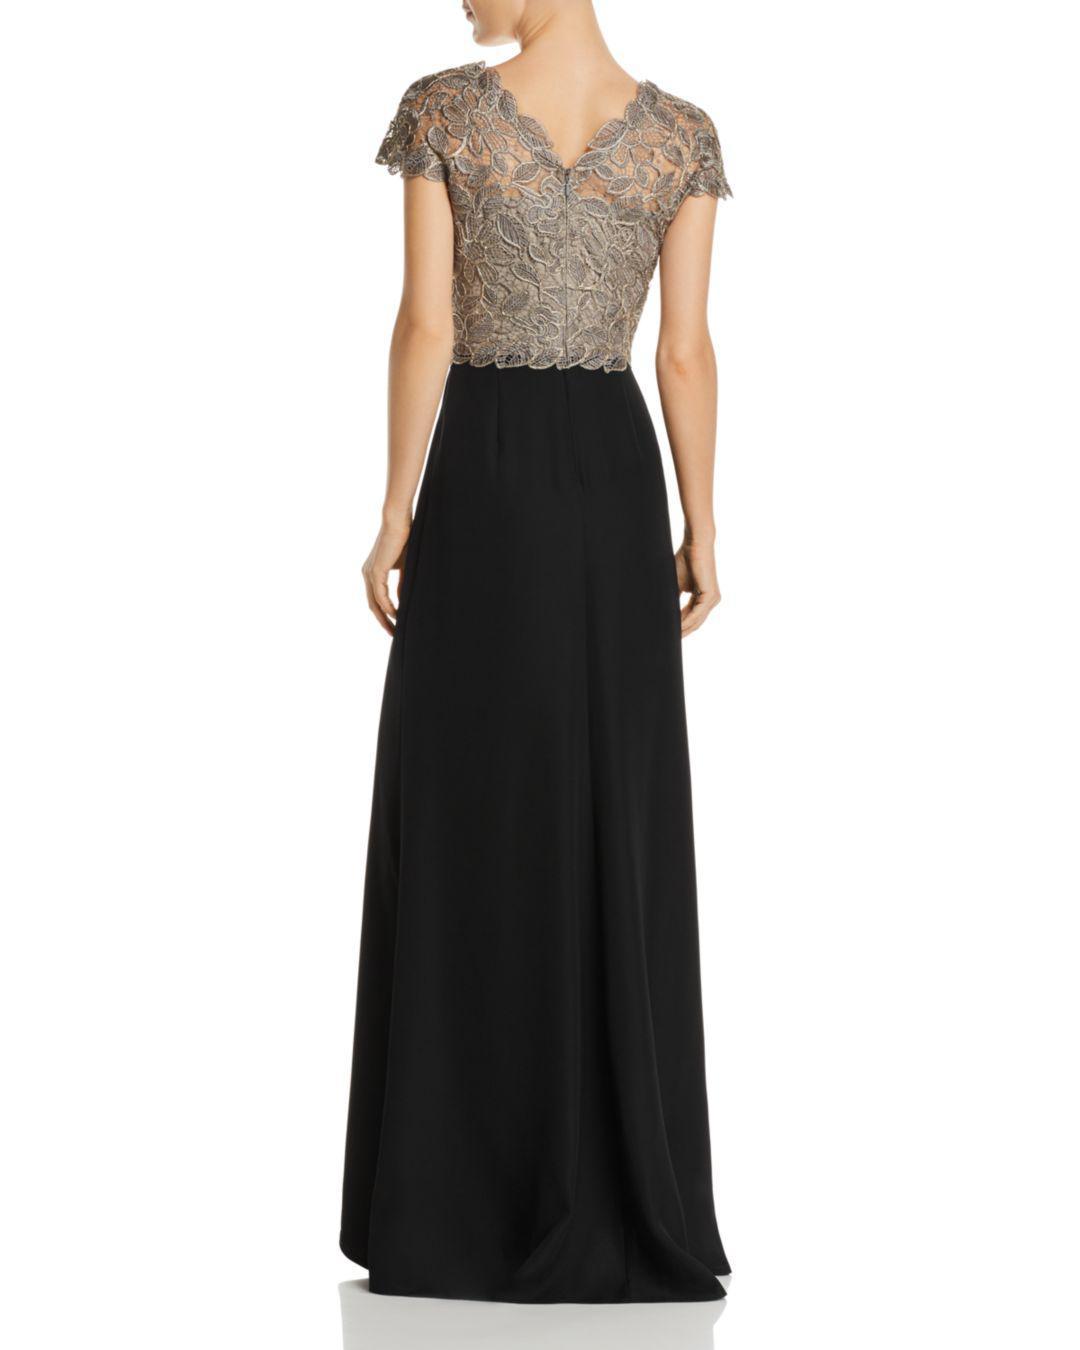 5dc2907c85ca Lyst - Tadashi Shoji Lace Bodice Gown in Black